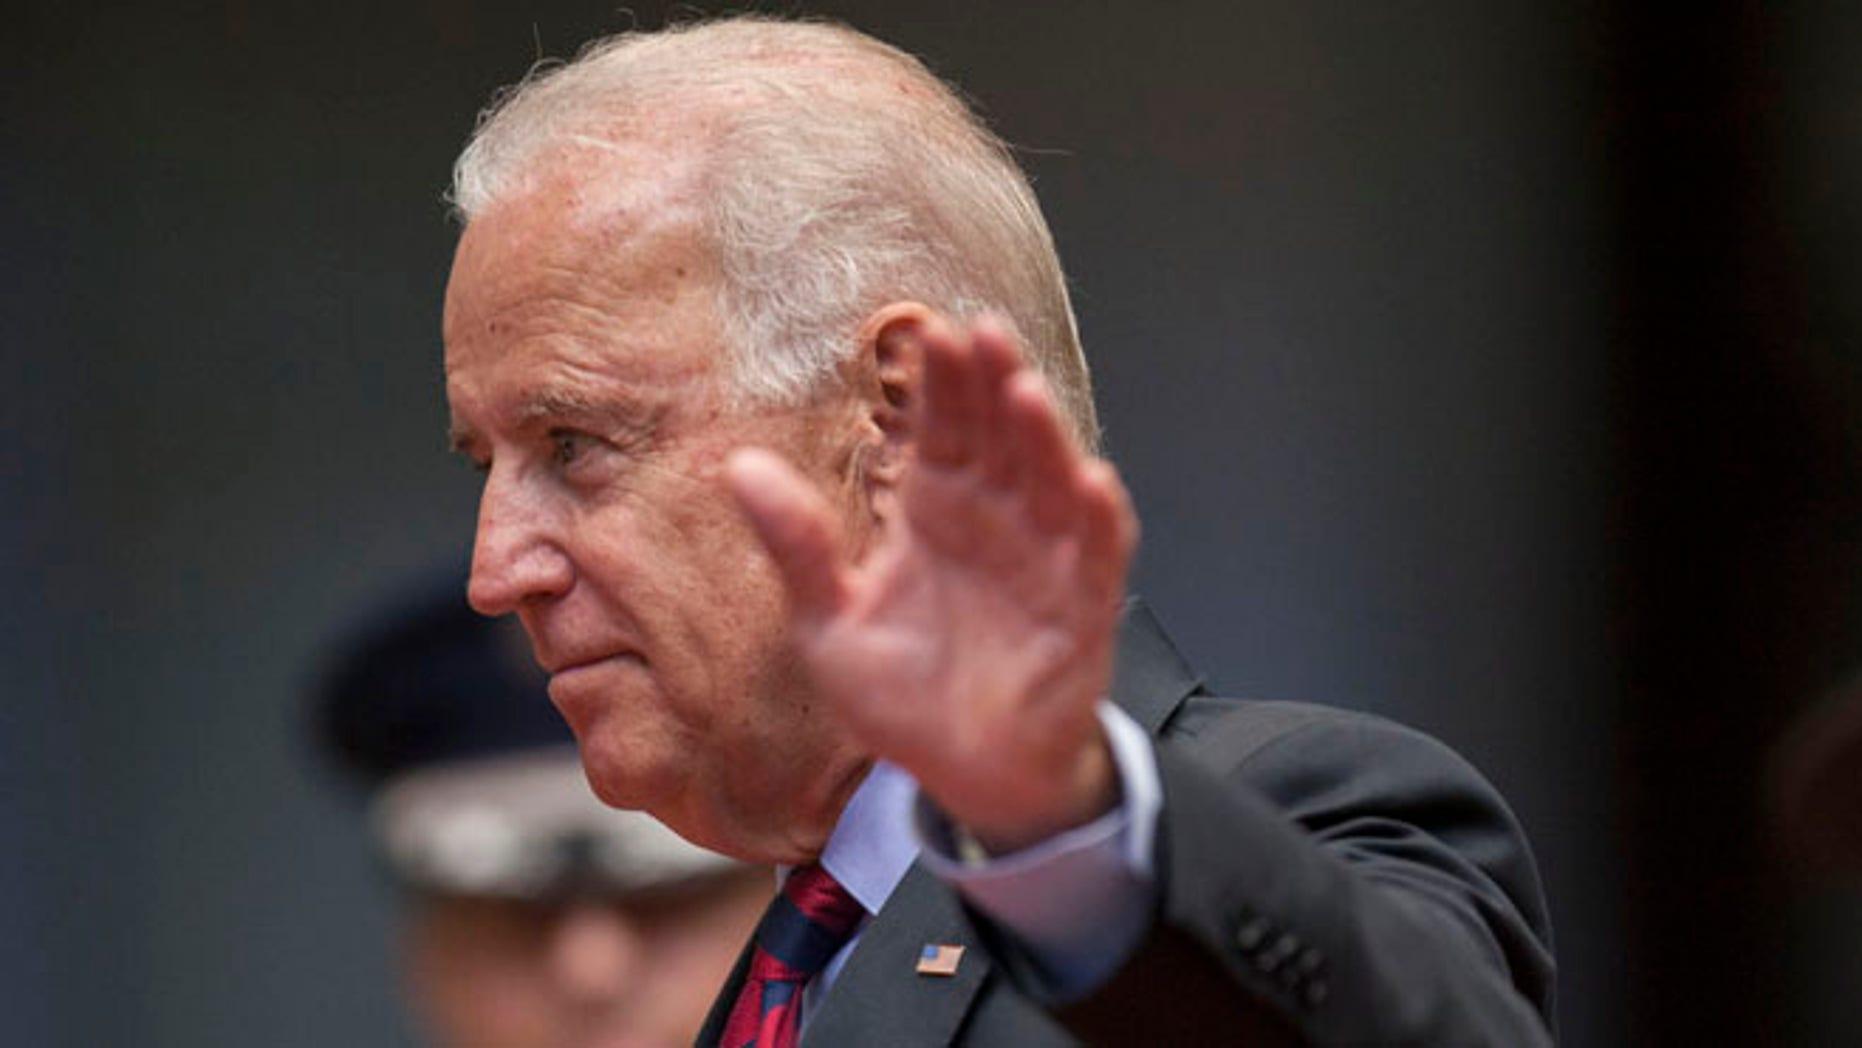 U.S. Vice President Joe Biden waves to photographers at the National Palace in Guatemala City, Friday, June 20, 2014.